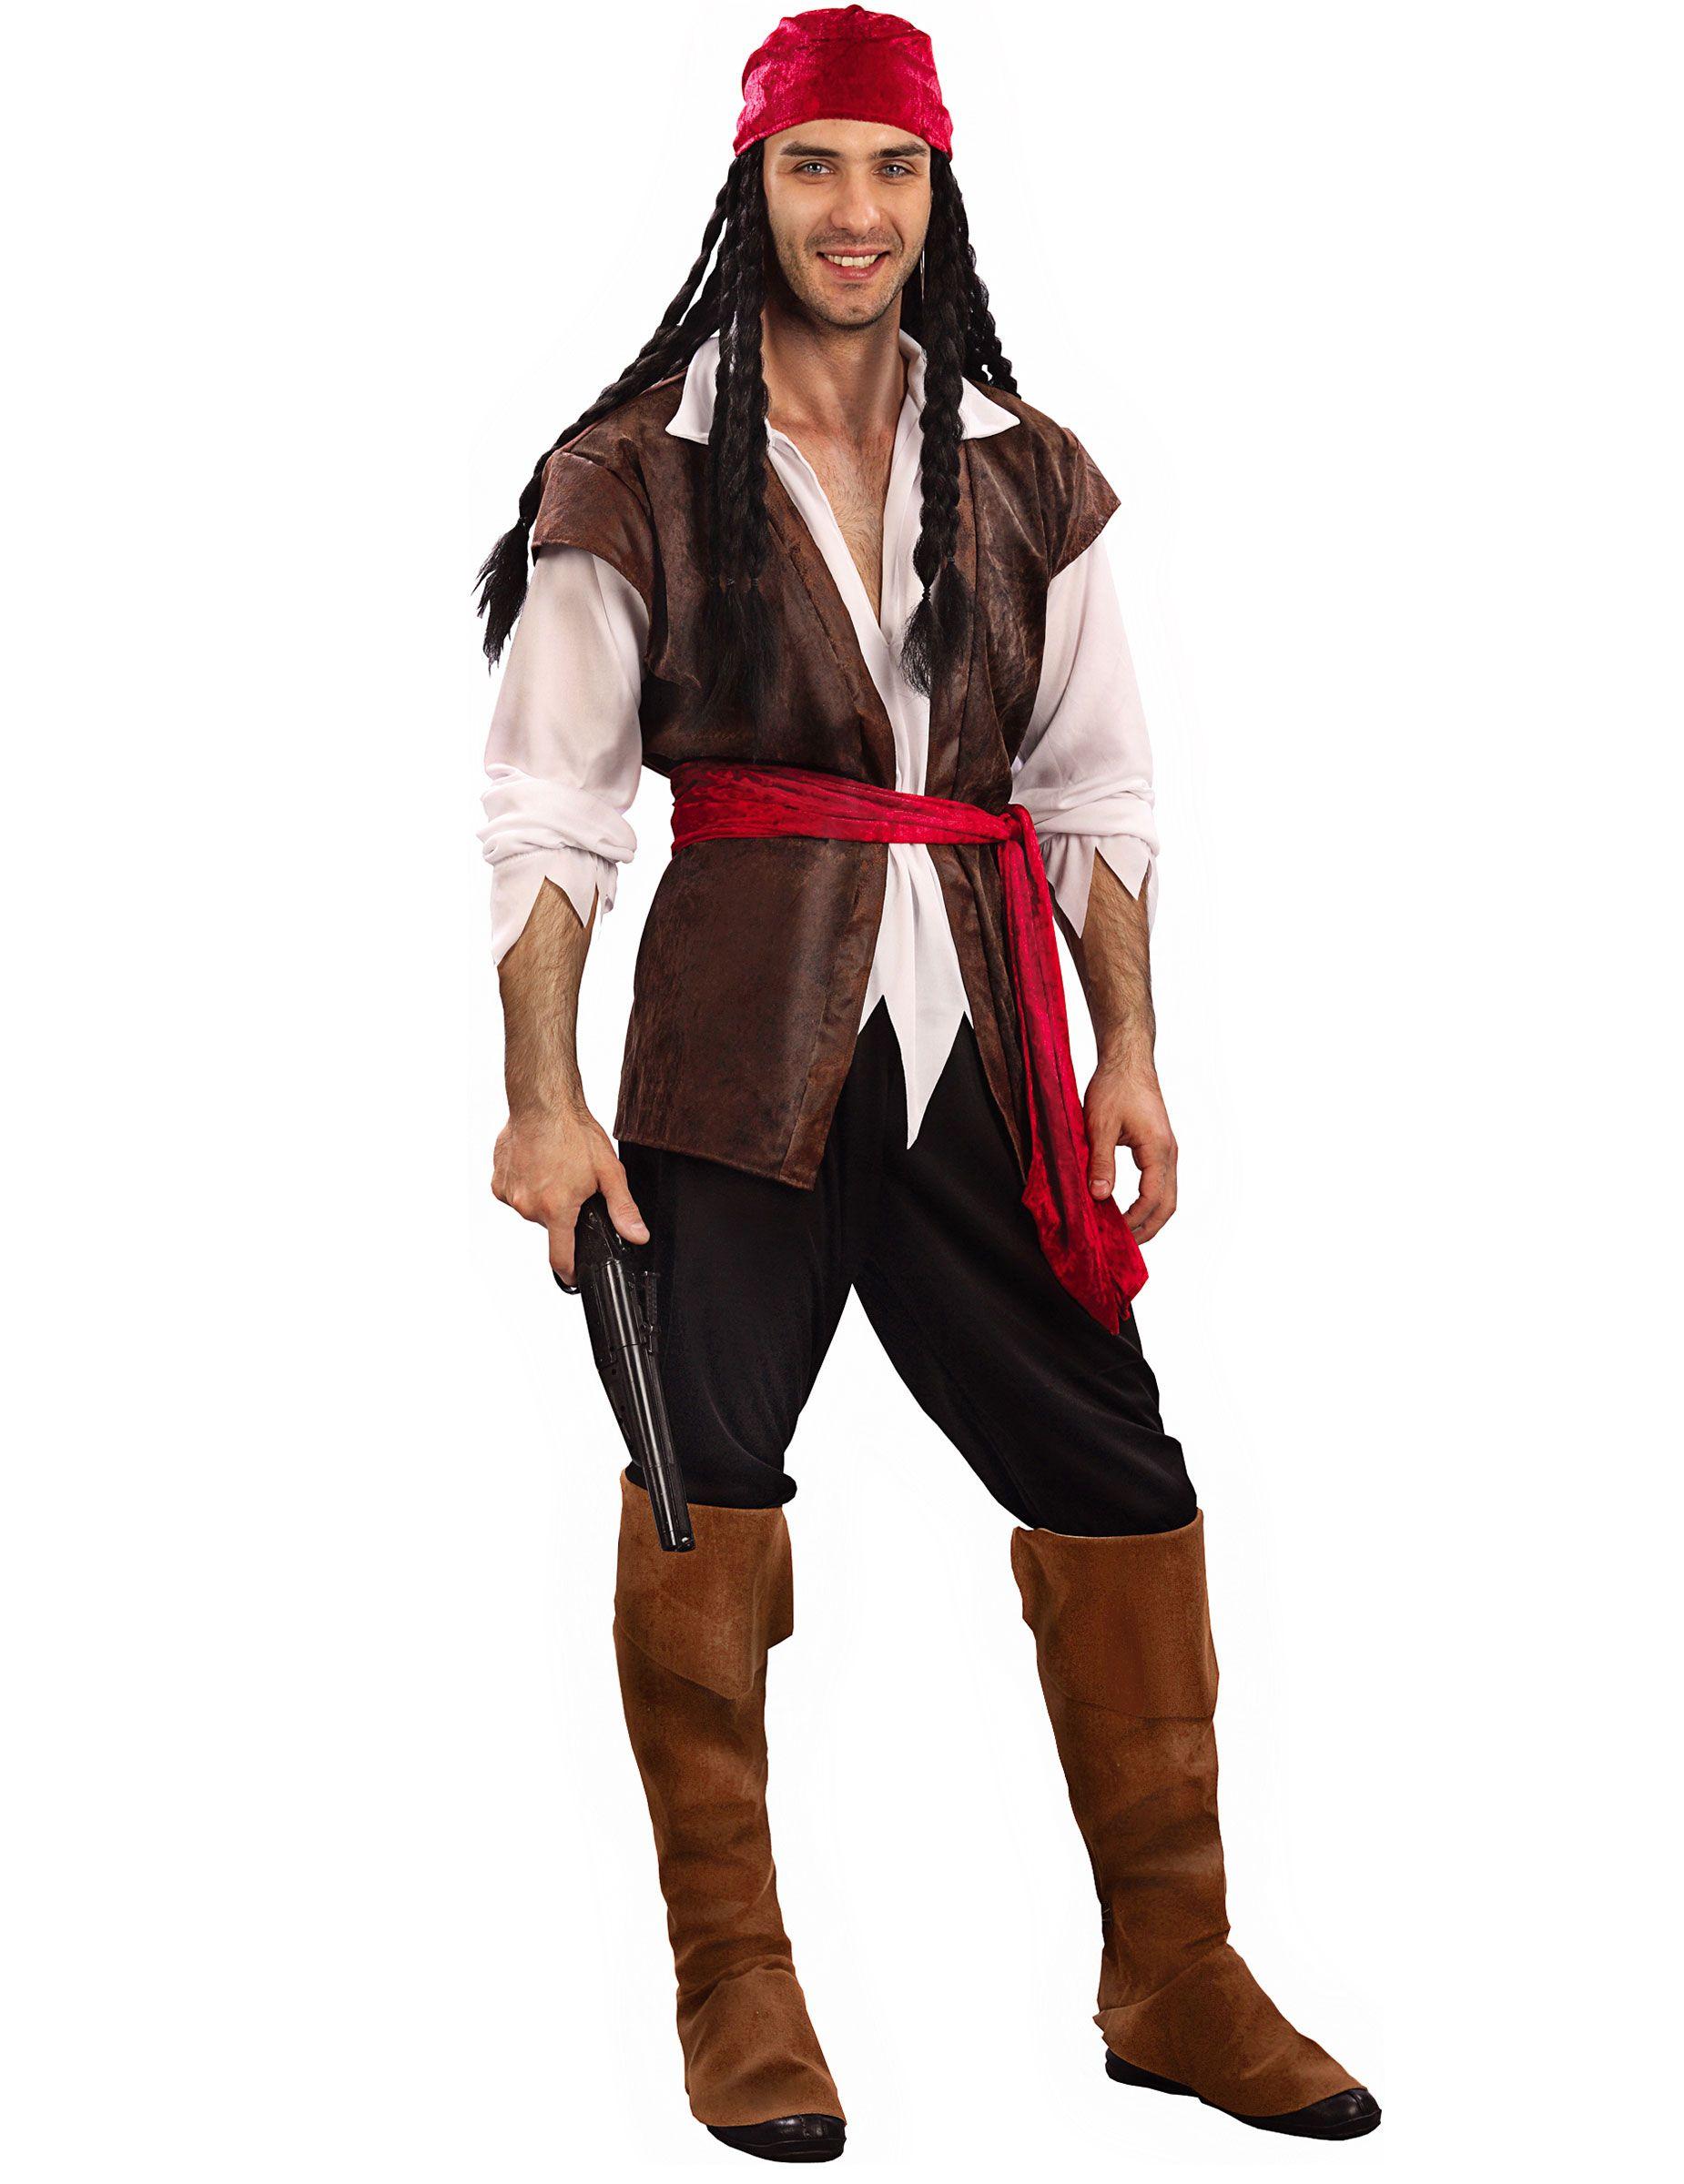 3de3c8b4b03 Resultado de imagen para disfraz pirata hombre